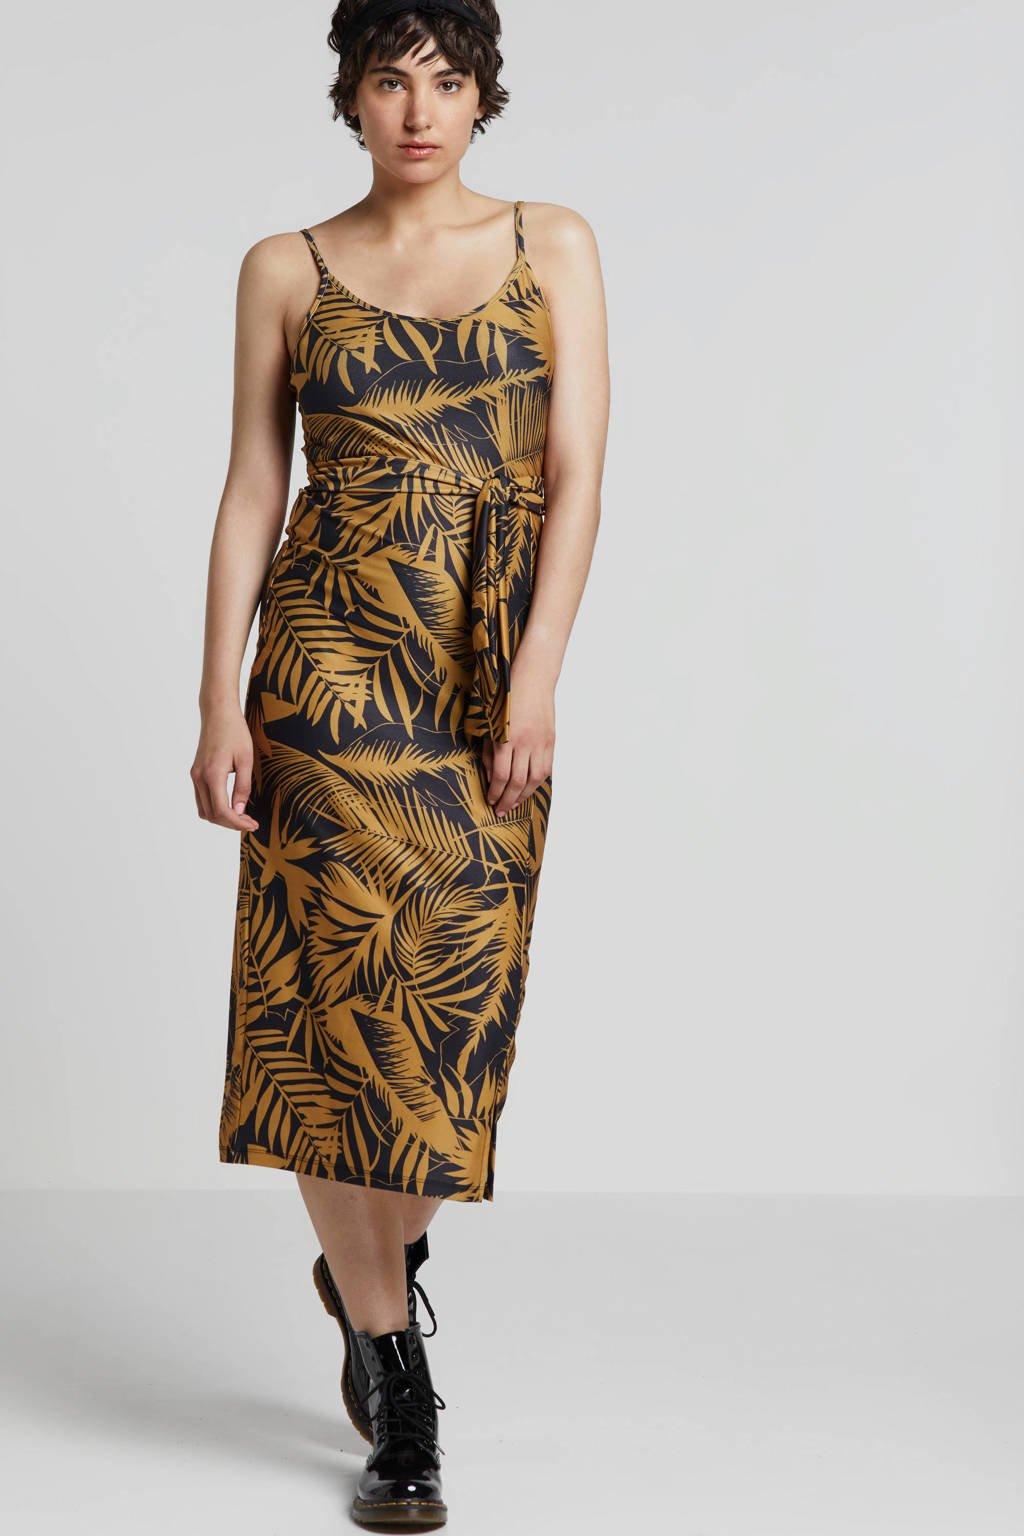 whkmp's beachwave jurk met bladprint, Zwart/oker